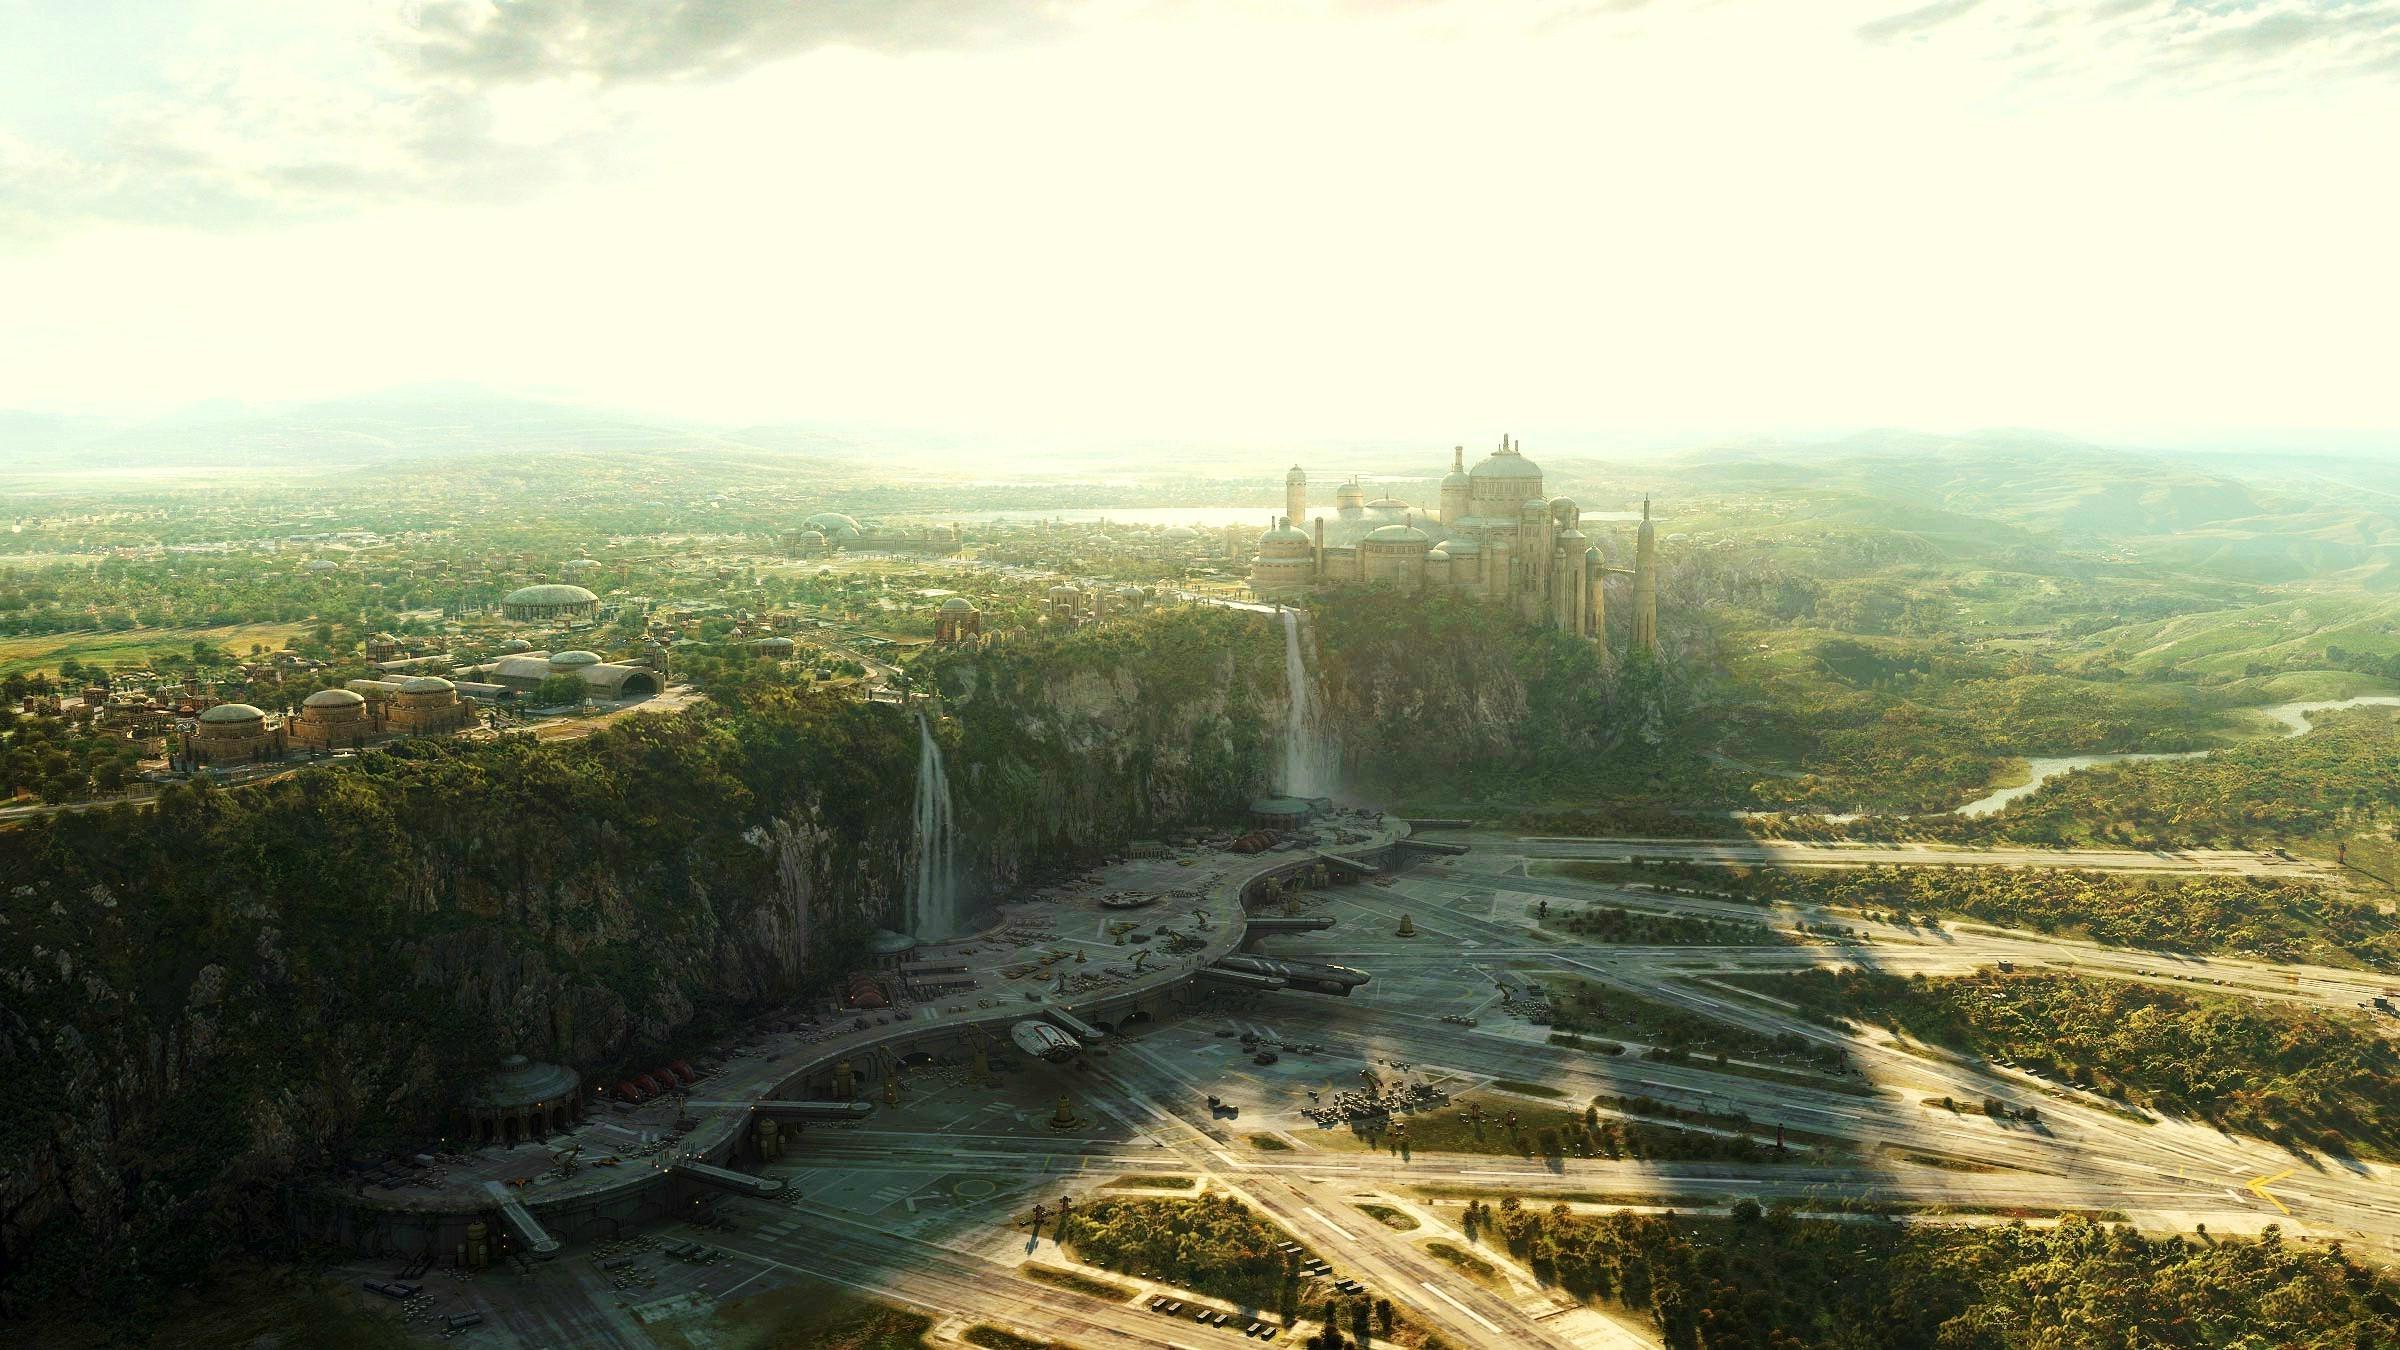 Naboo, Star Wars - Star Wars Naboo Background , HD Wallpaper & Backgrounds